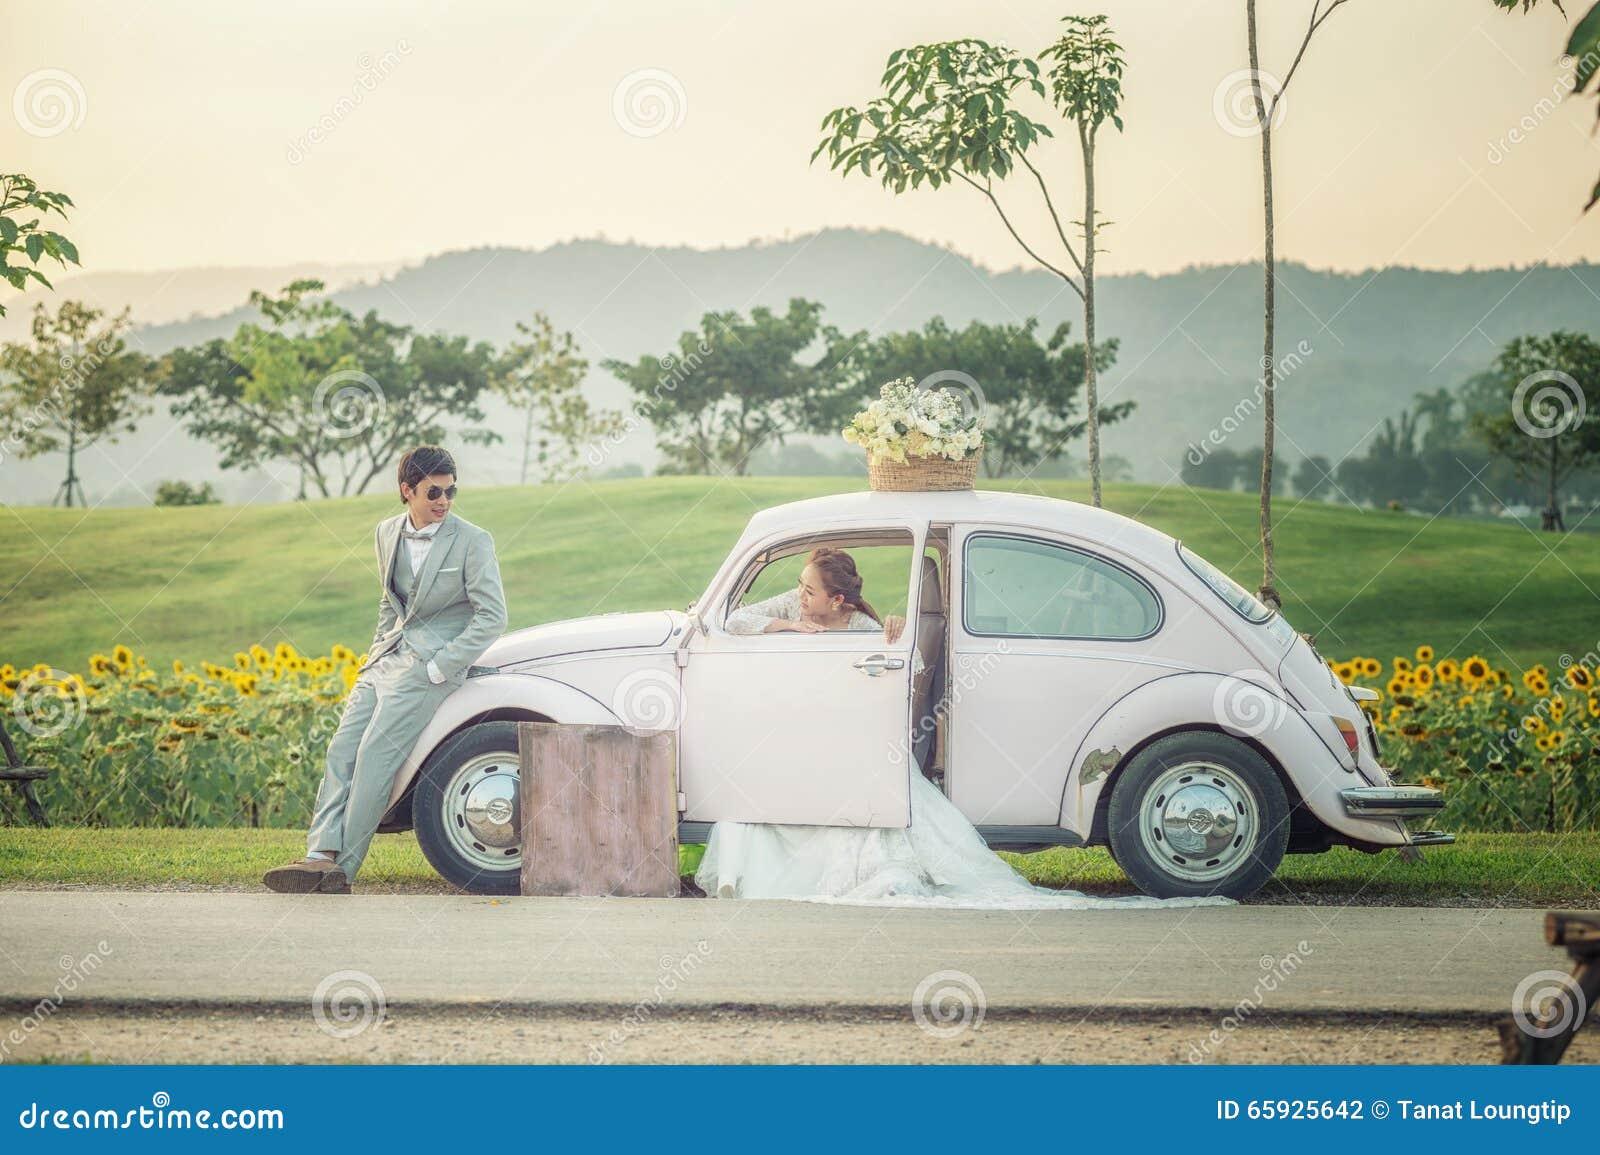 Asia Wedding Couple Enjoy On The Old Car Stock Photo Image Of Love Couple 65925642